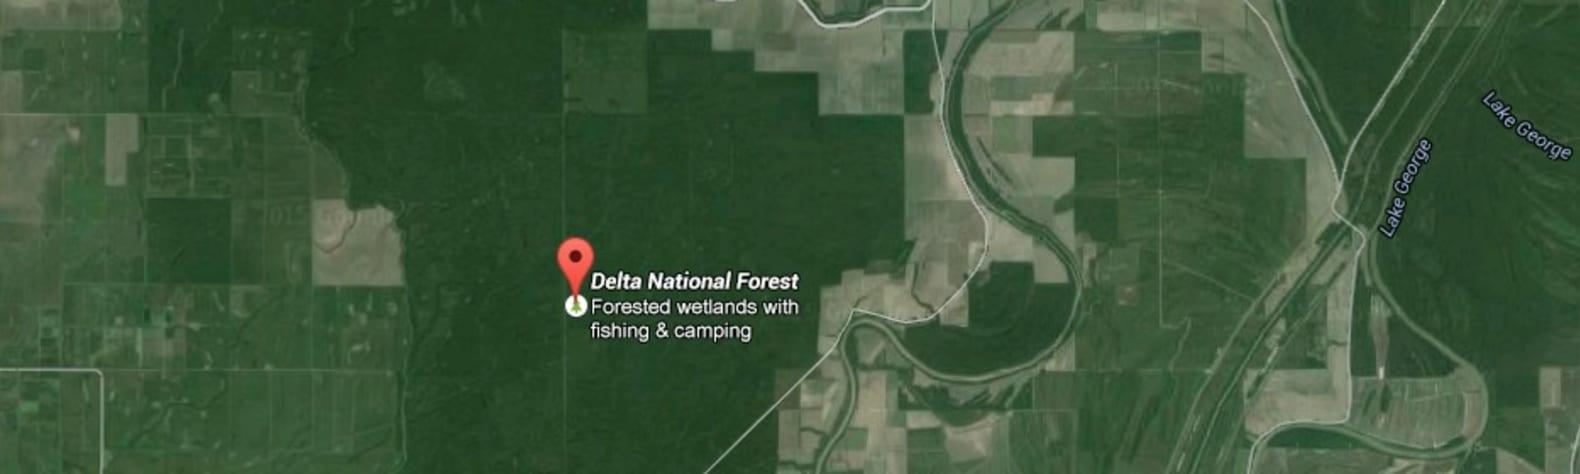 Delta National Forest